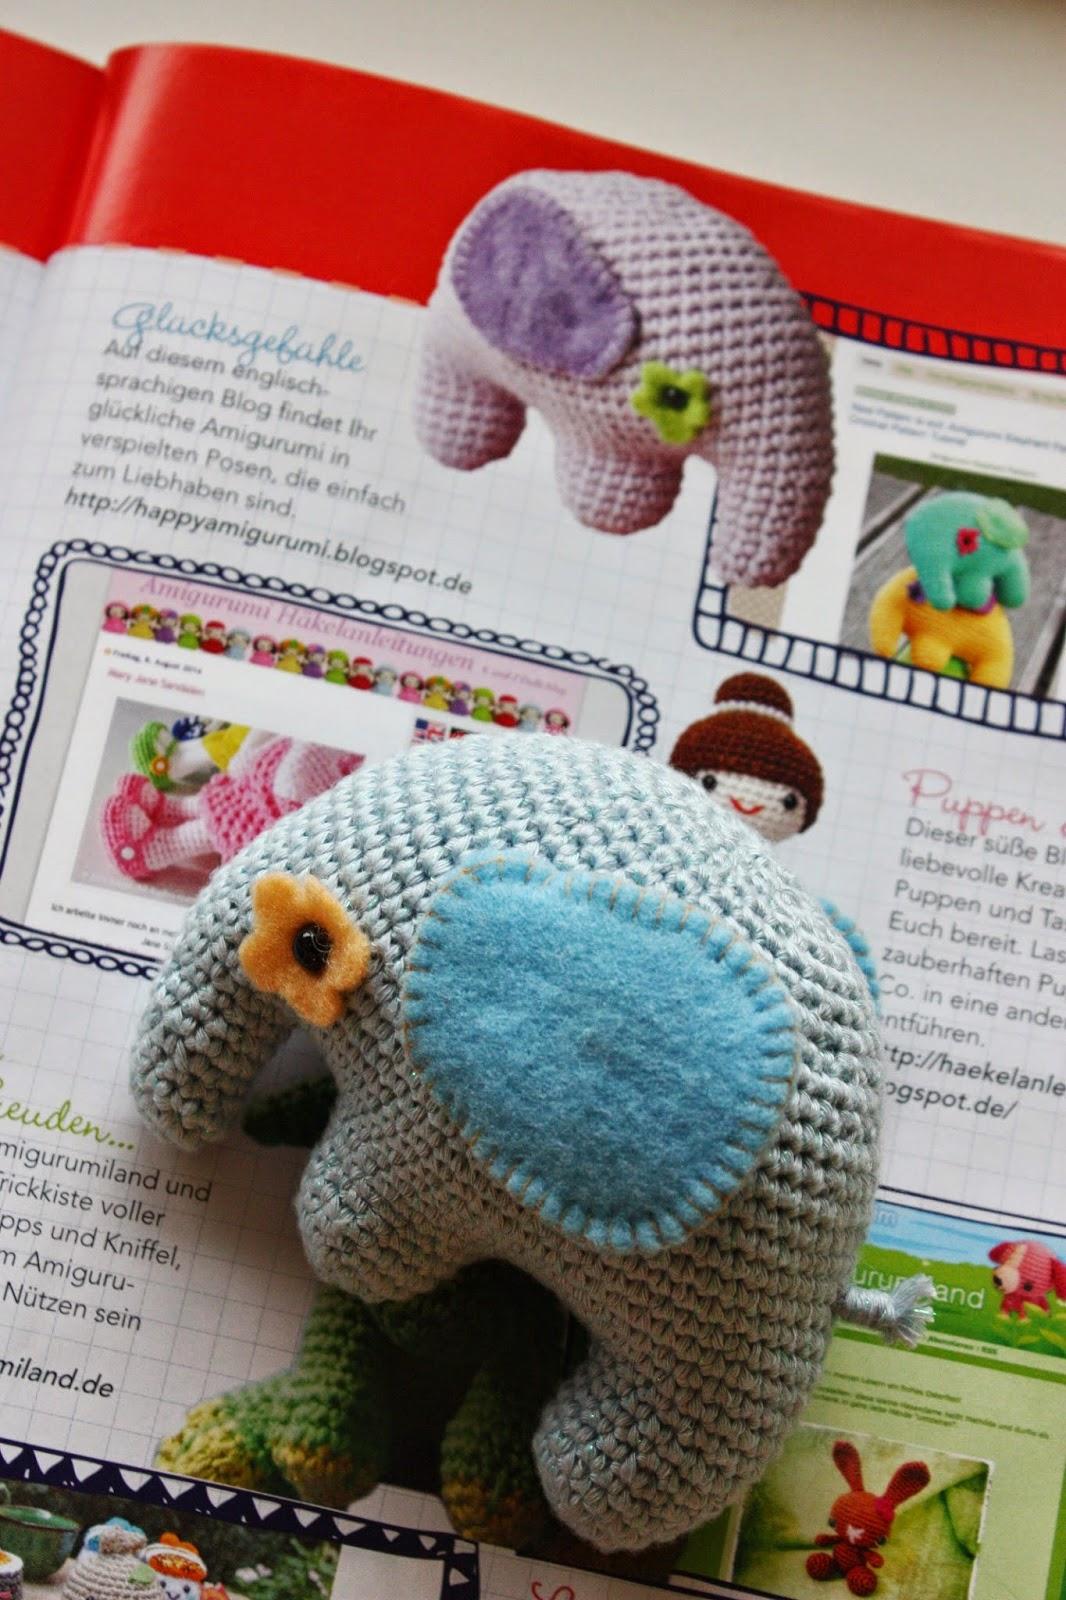 48+ Fantastic Amigurumi Crochet Pattern Ideas for 2020 - Page 10 ...   1600x1066